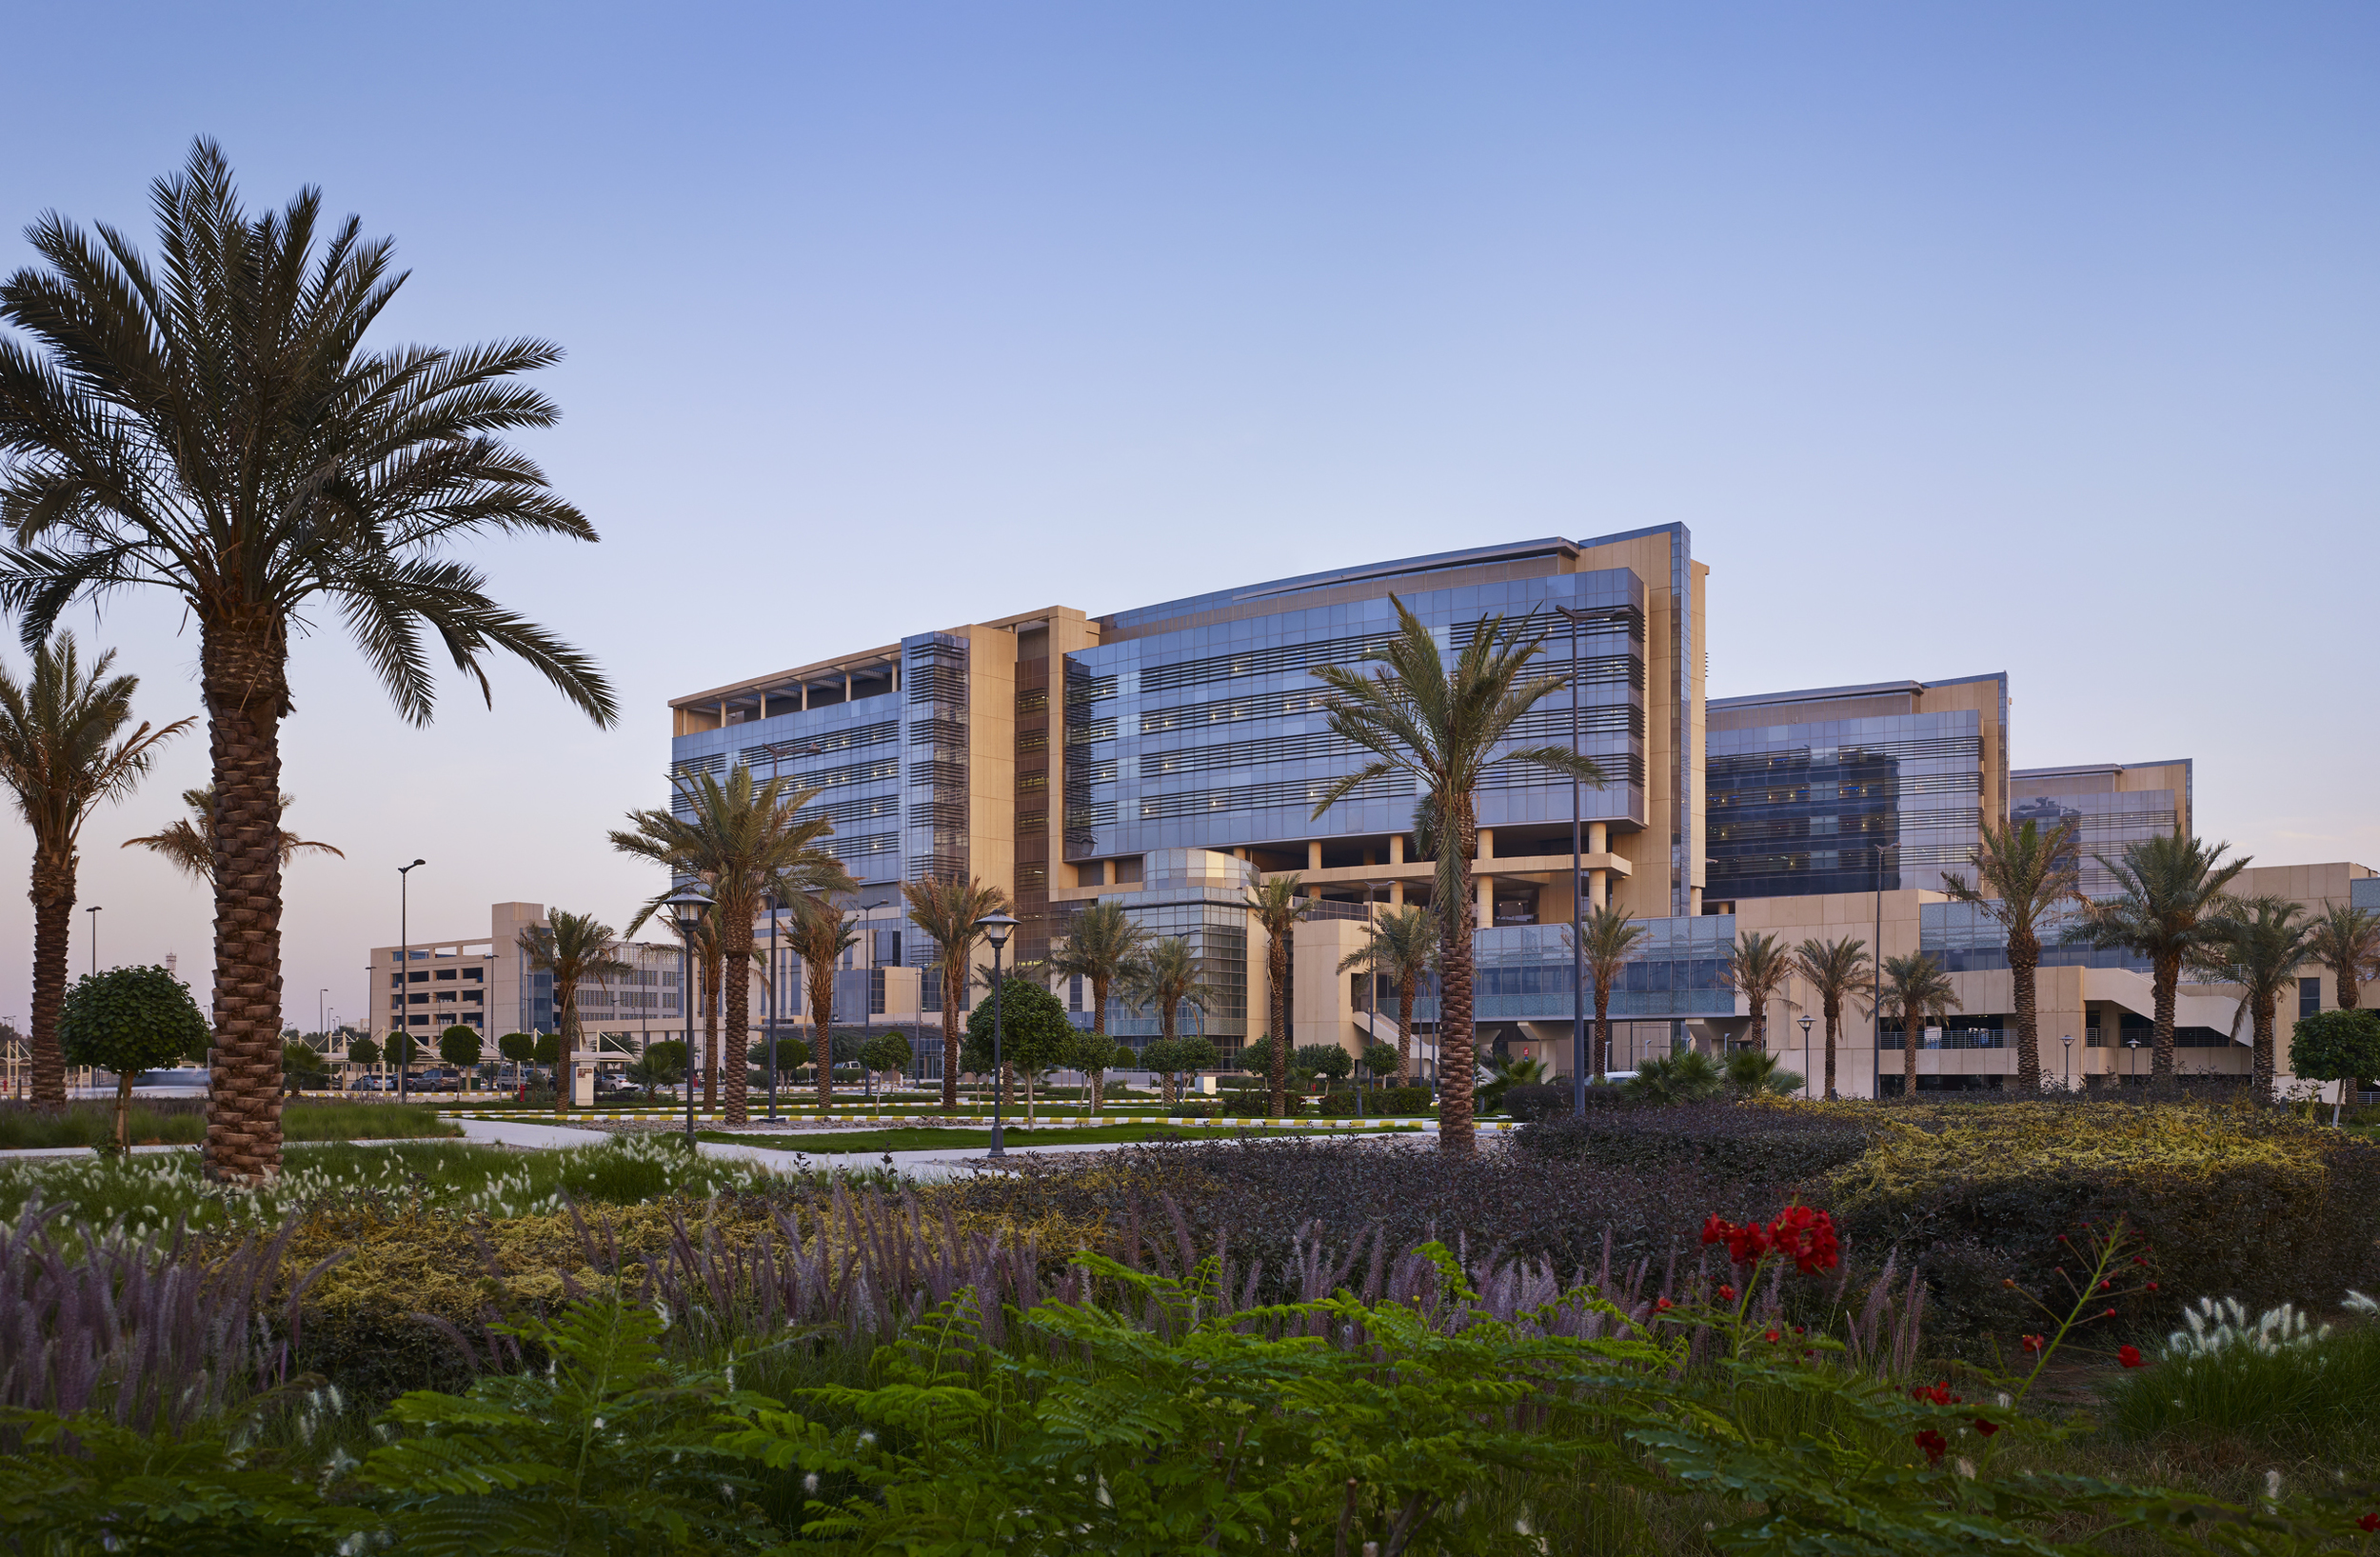 King Abdullah Specialist Children Hospital  Perkins+Will with Dar Al Handasah (Shair and Partners)  Riyadh,Saudi Arabia     Return to Projects